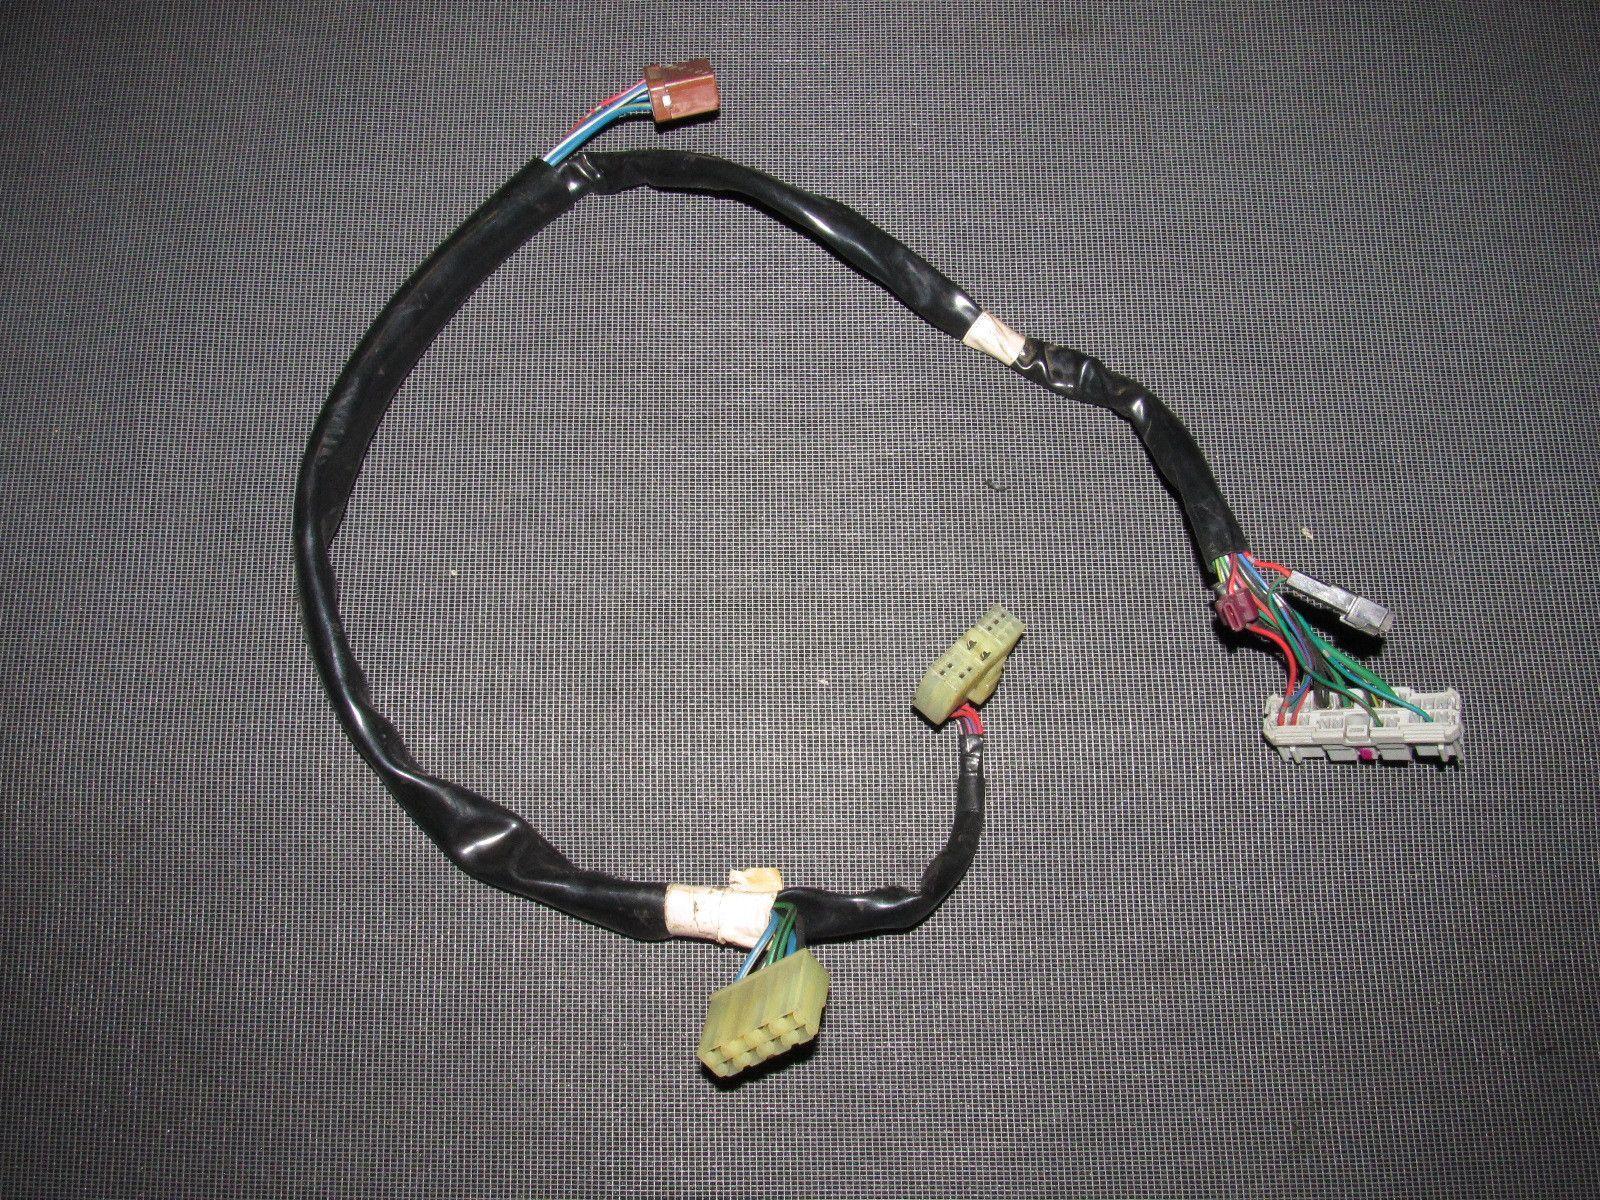 b7613b544b0168d88d2cac83388bdf55 94 95 96 honda prelude si oem h23 speedometer wiring harness honda prelude wiring harness at readyjetset.co